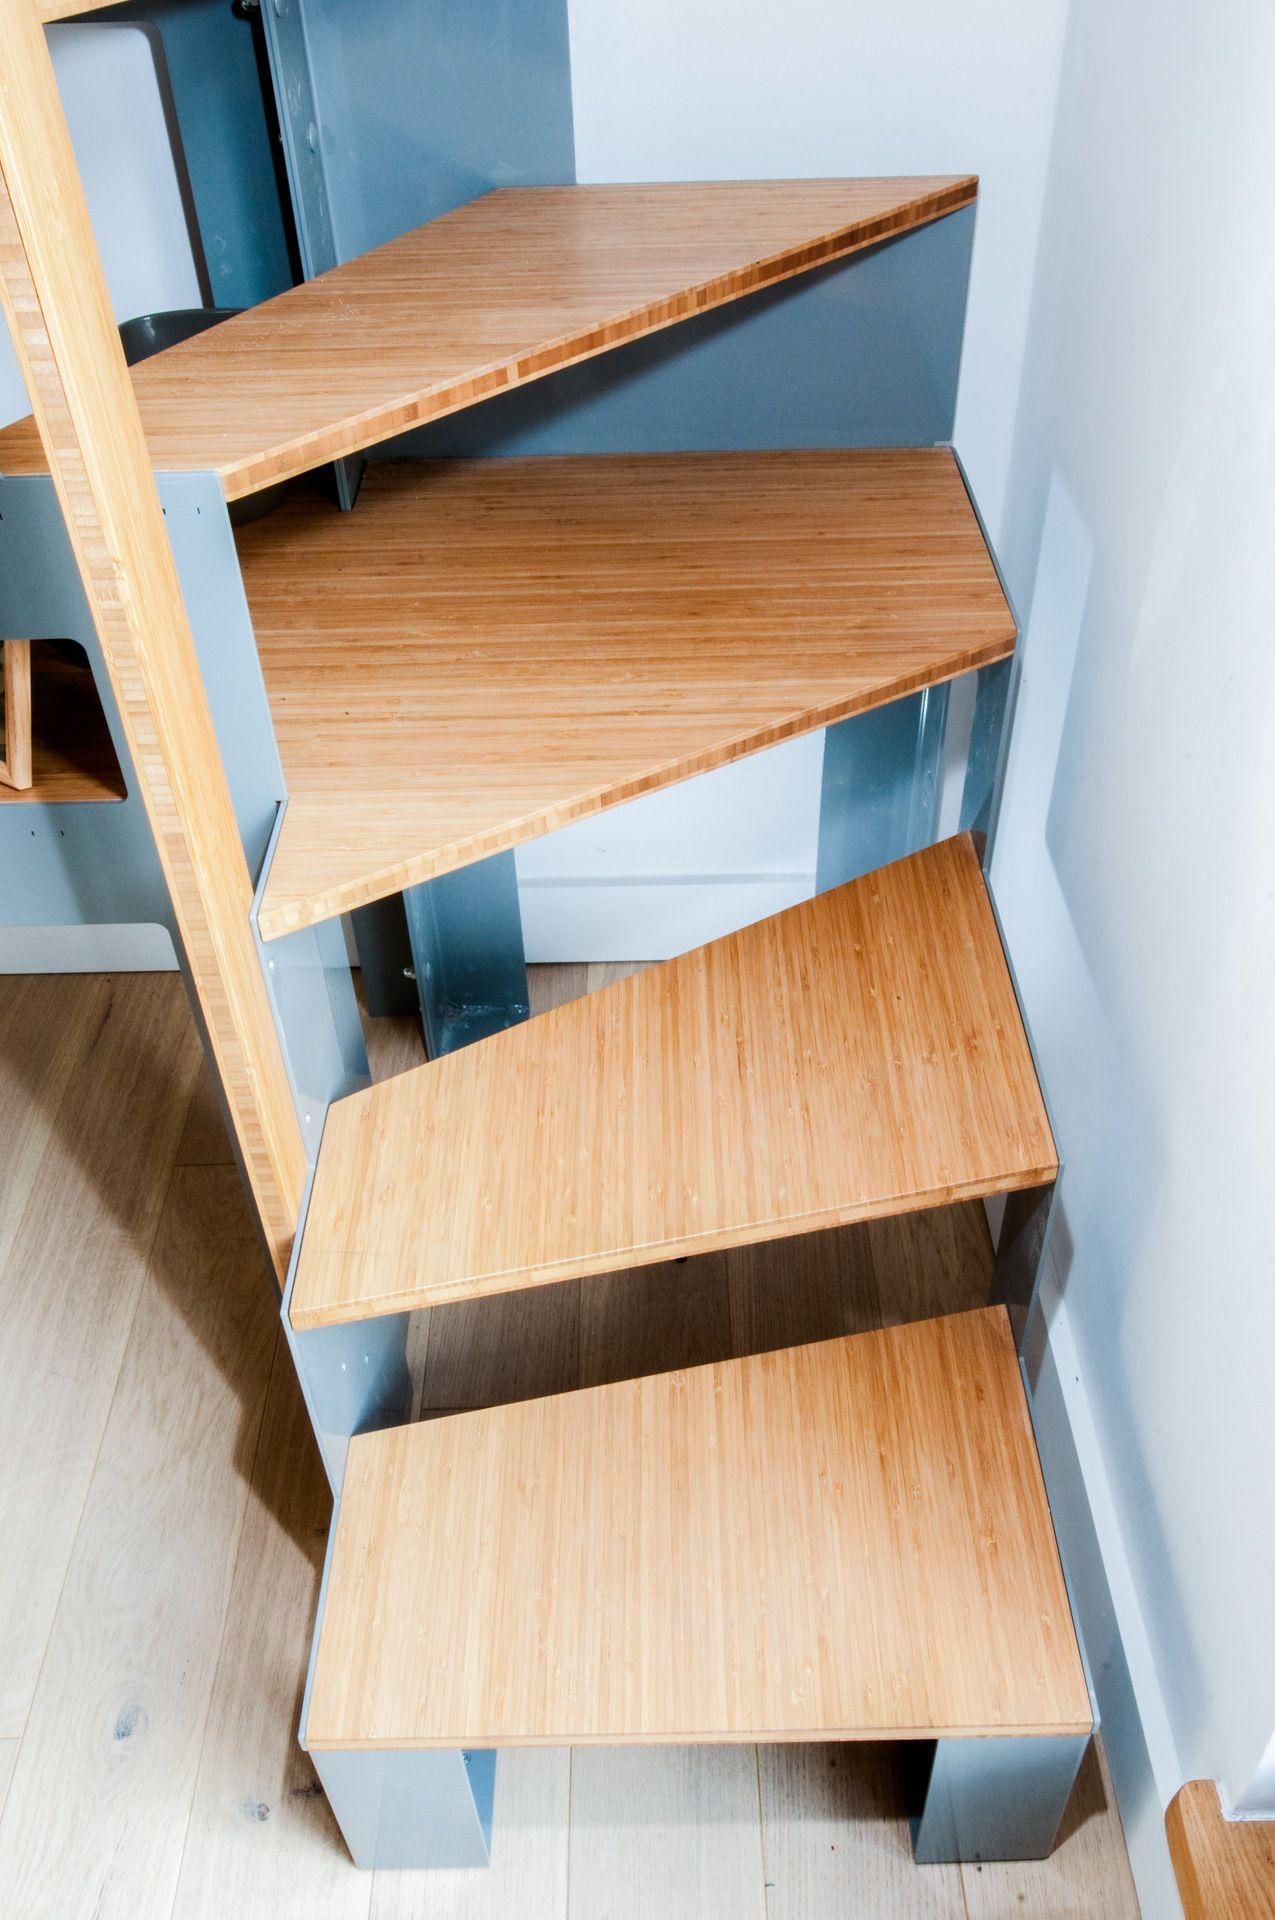 Escalier Sur Mesure Libro De Joa Rangement Livre Meuble Tv Sur Mesure Escalier